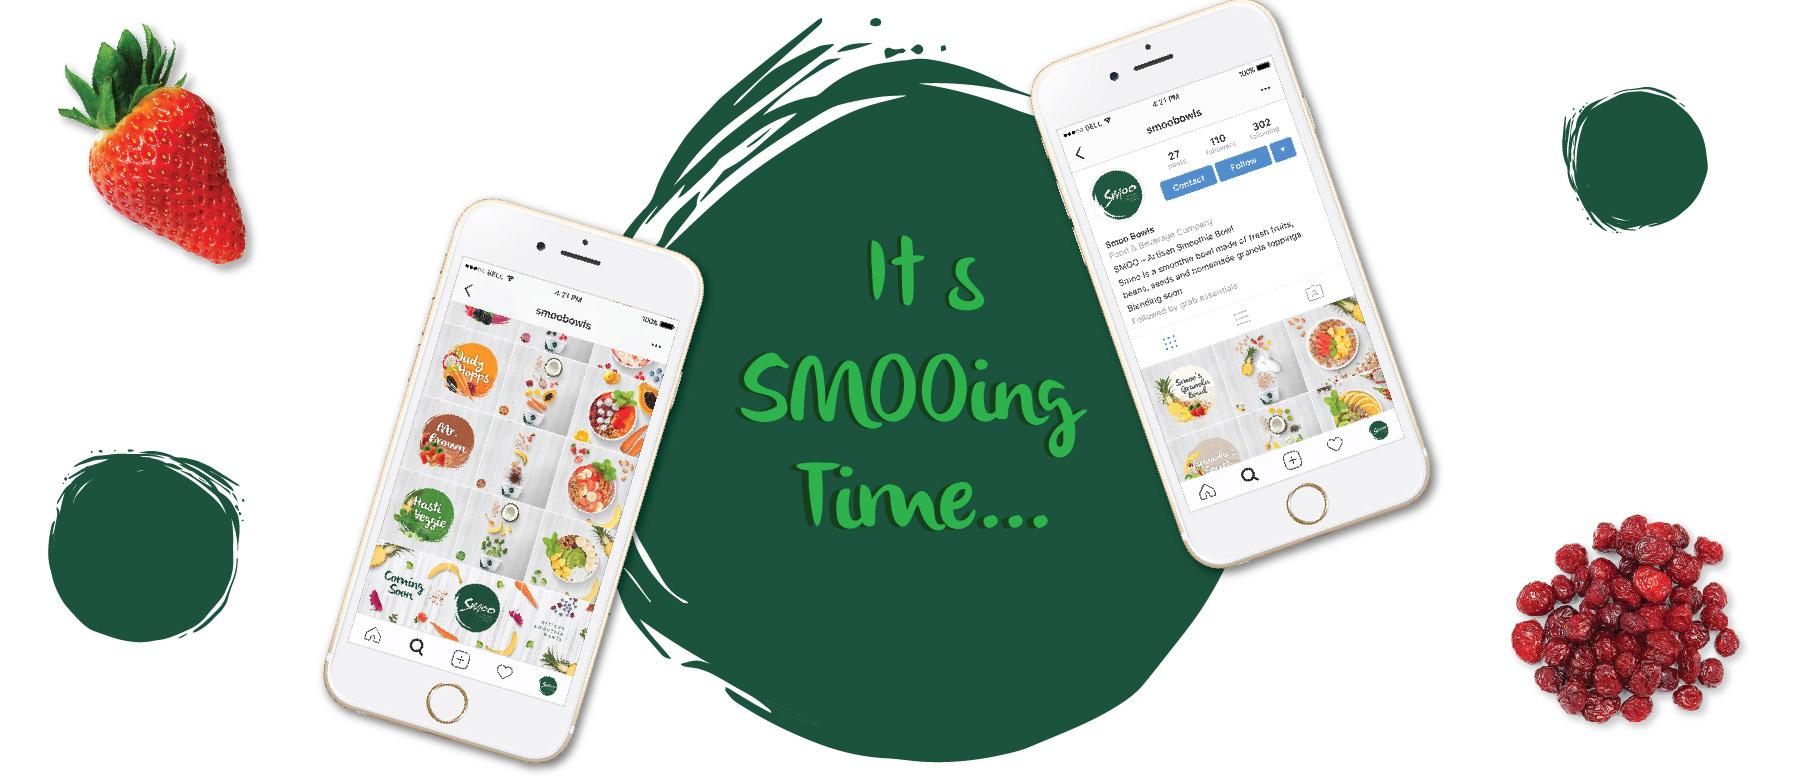 Smoo bowls social Media Management by Grab Essentials